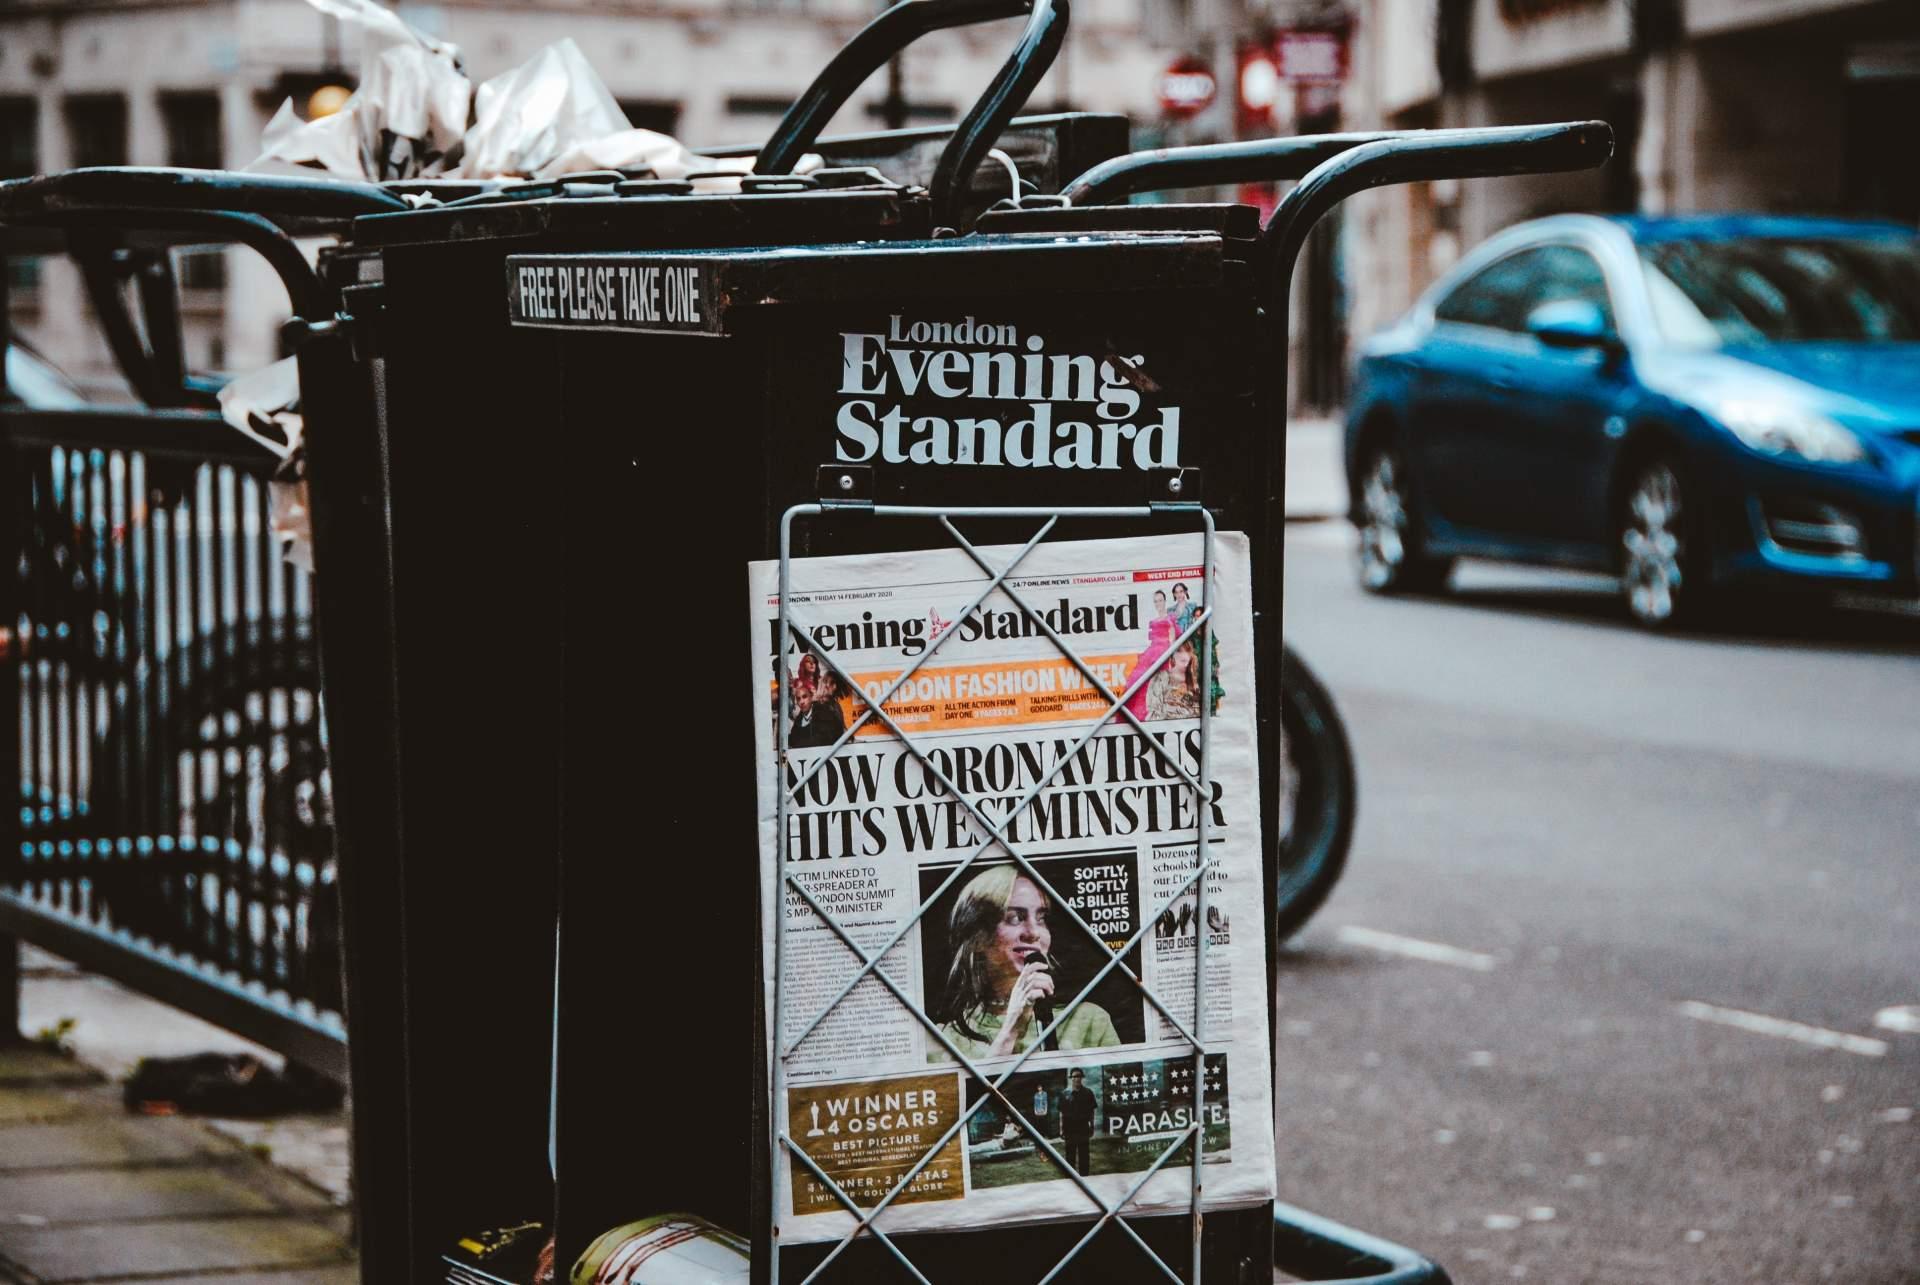 London evening standard newspaper stand showing Coronavirus article